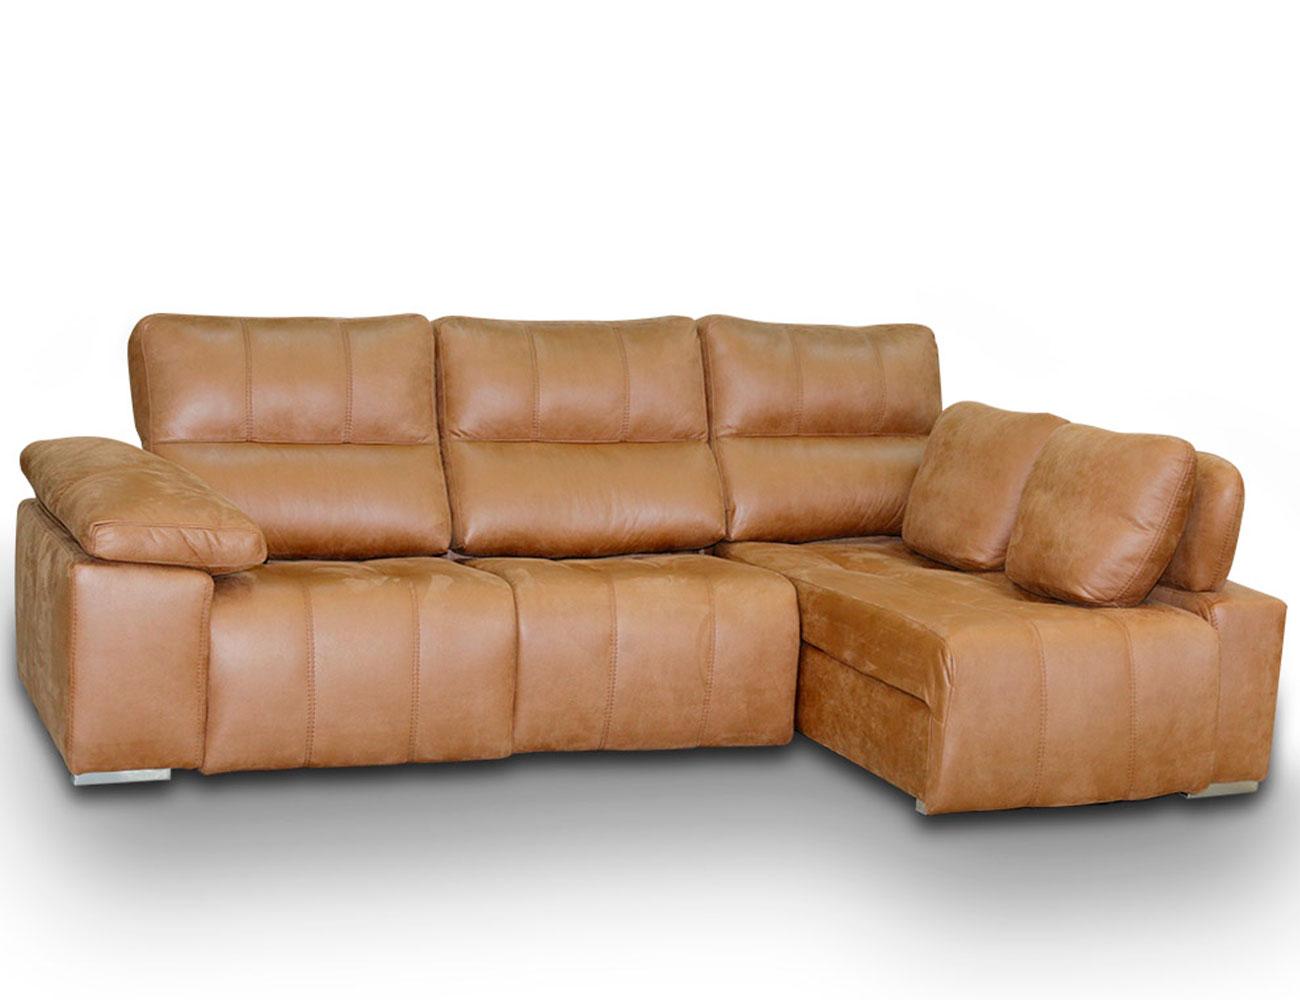 Sofa chaiselongue relax 2 motores anti manchas19